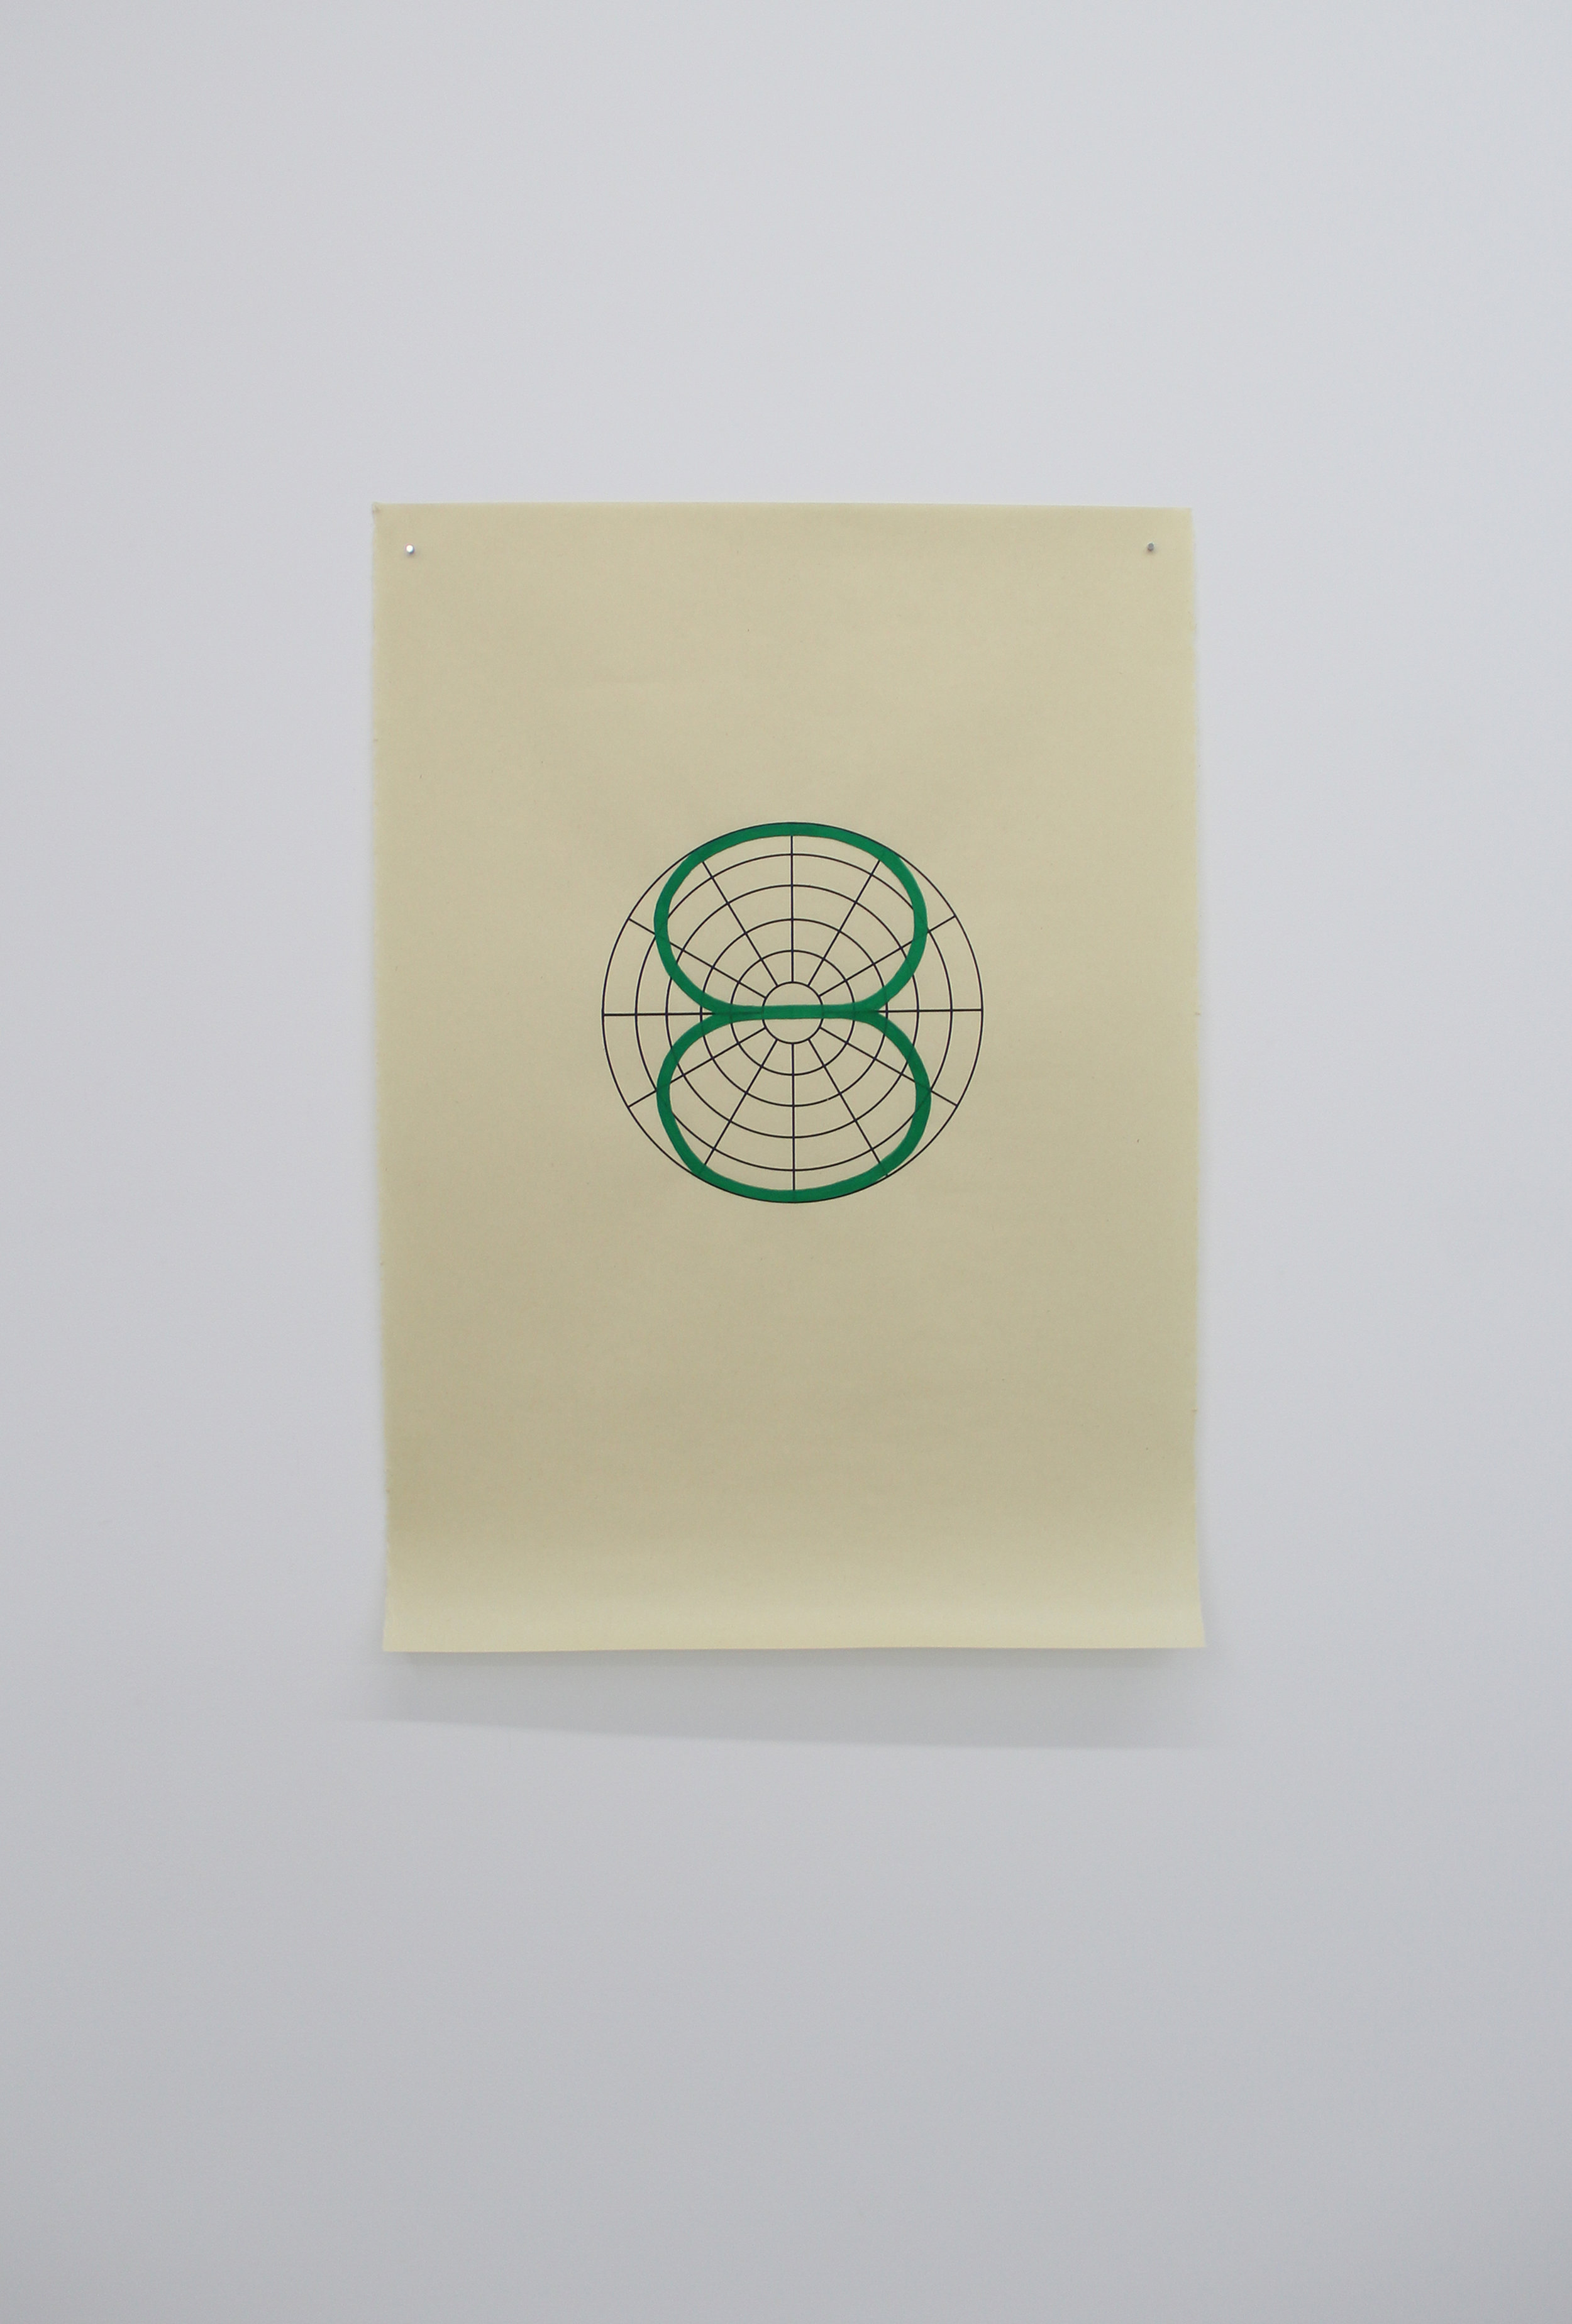 Antonin Gerson,  Vert - Bi-directionnel,   sérigraphie, gouache, 58x84cm 2018